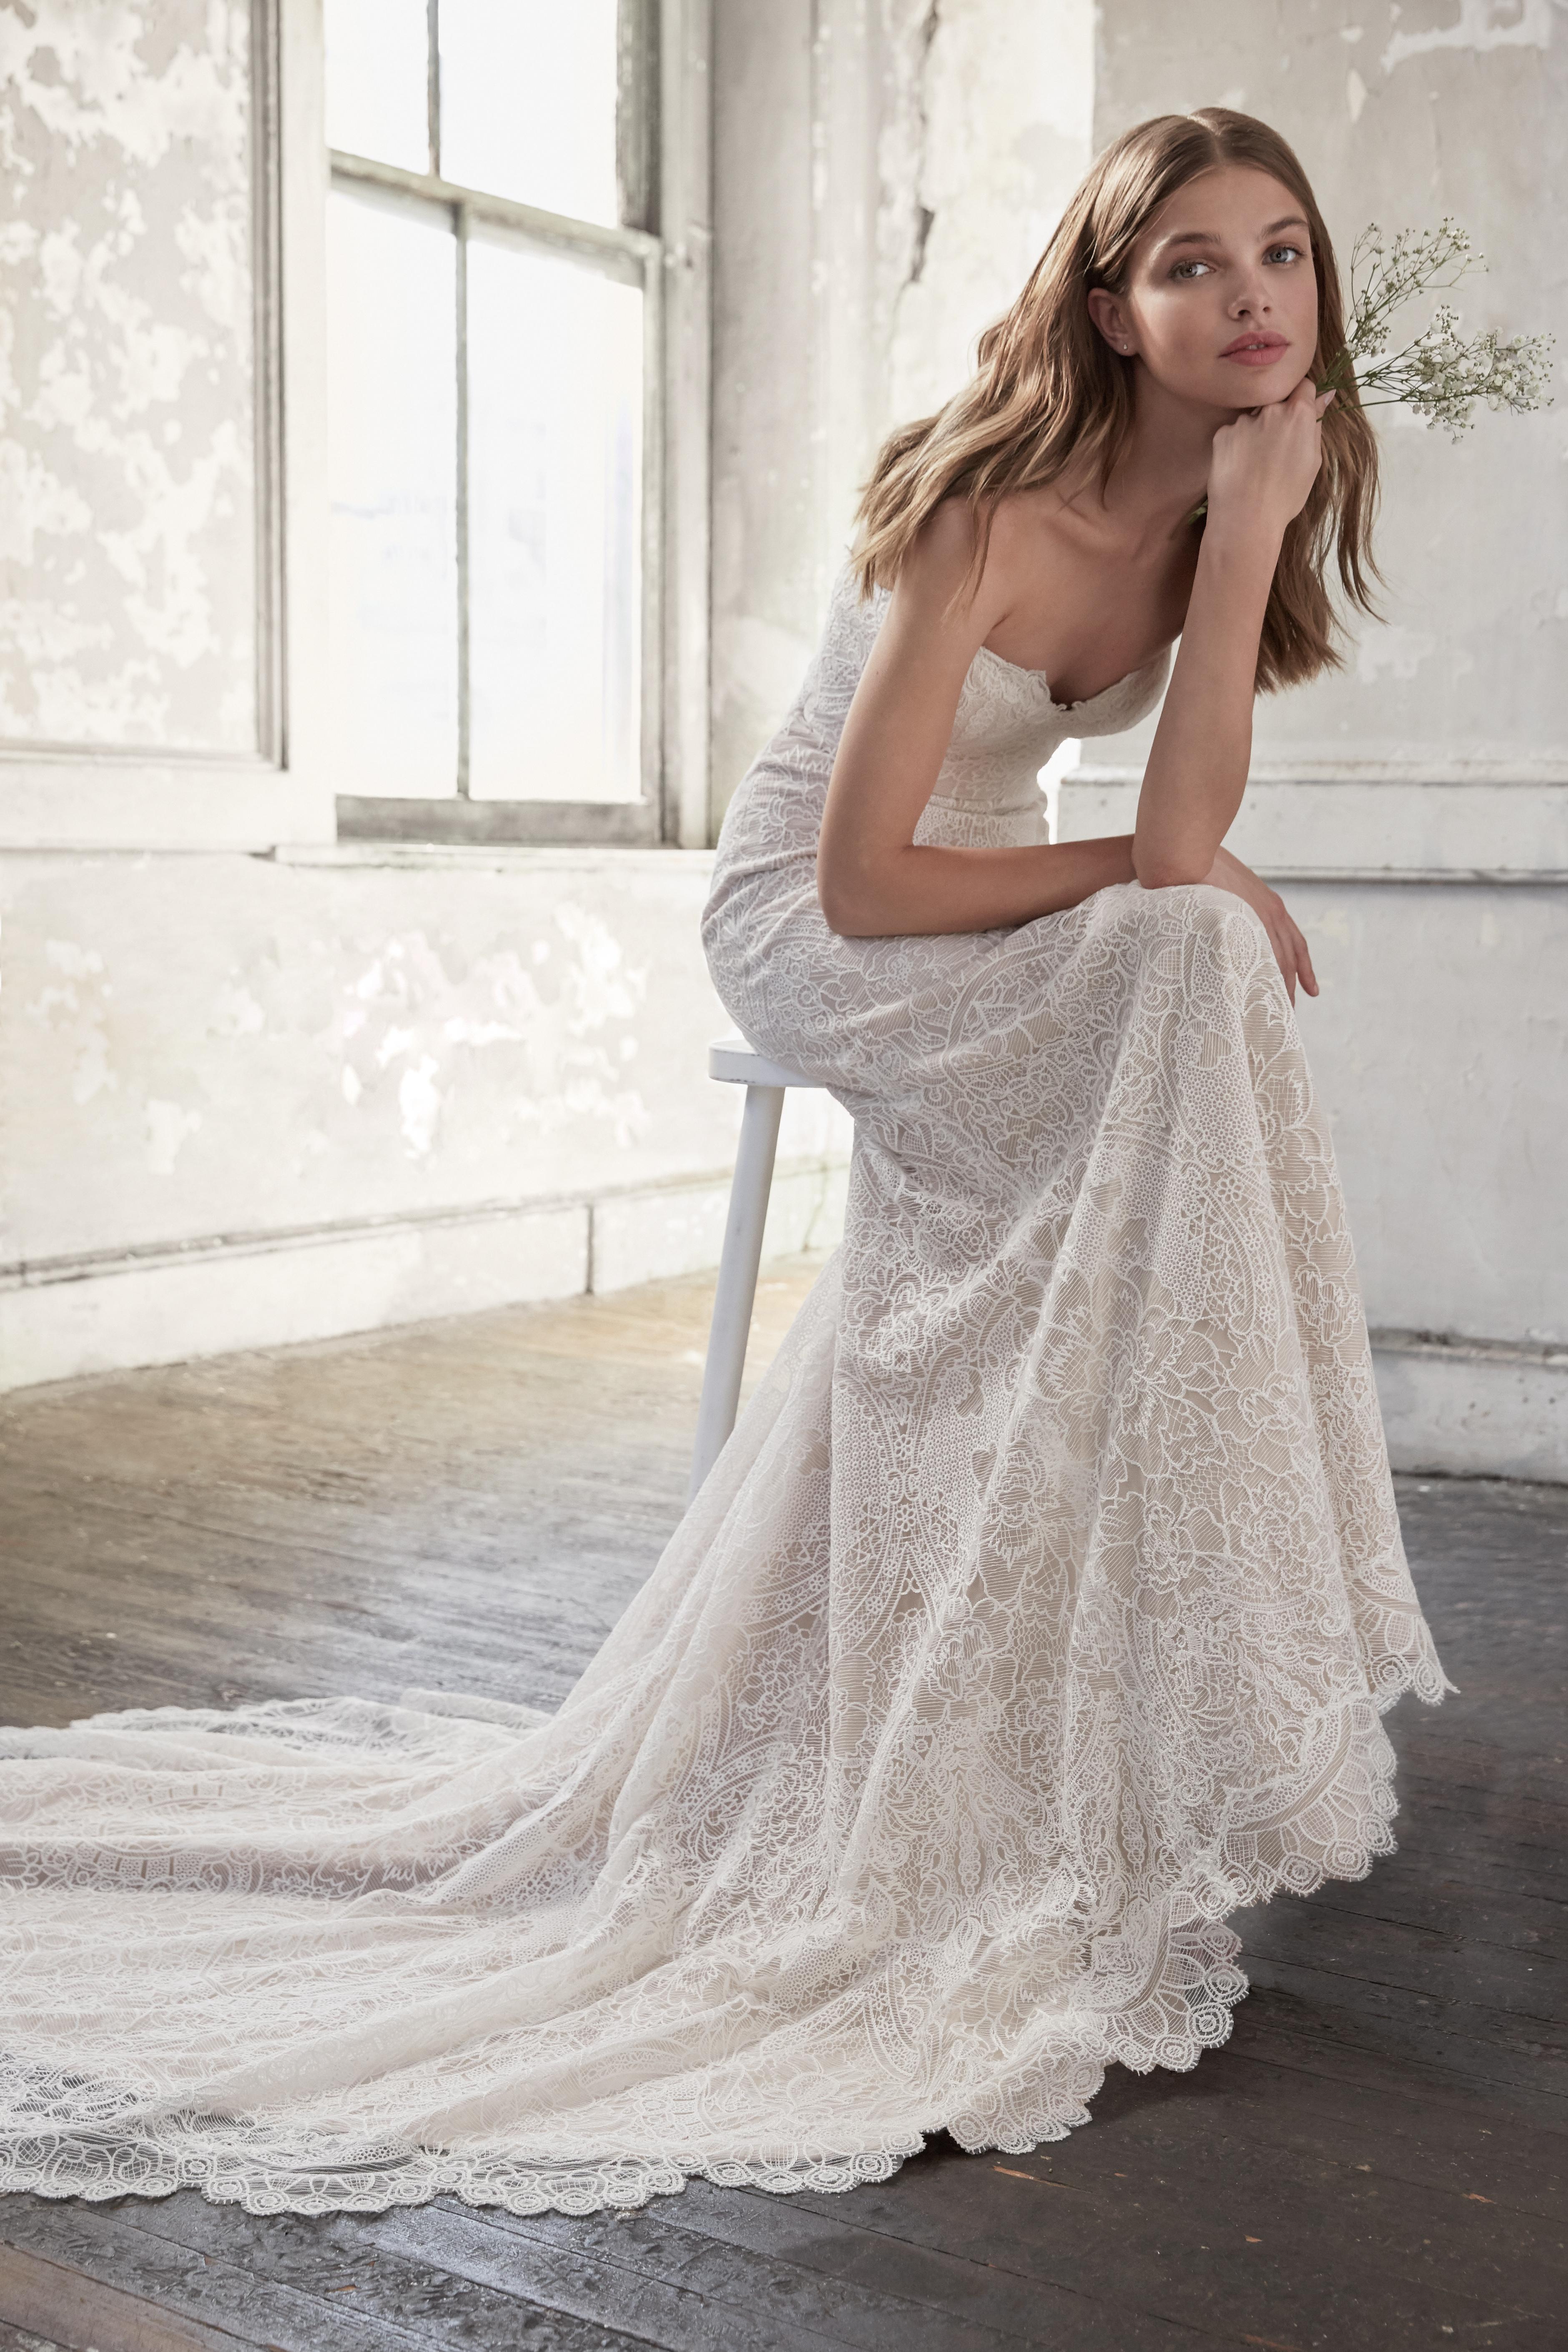 ti adora bridal addie wedding dresses Wedding Dress wedding dresses bridal shop store gowns christchurch wellington